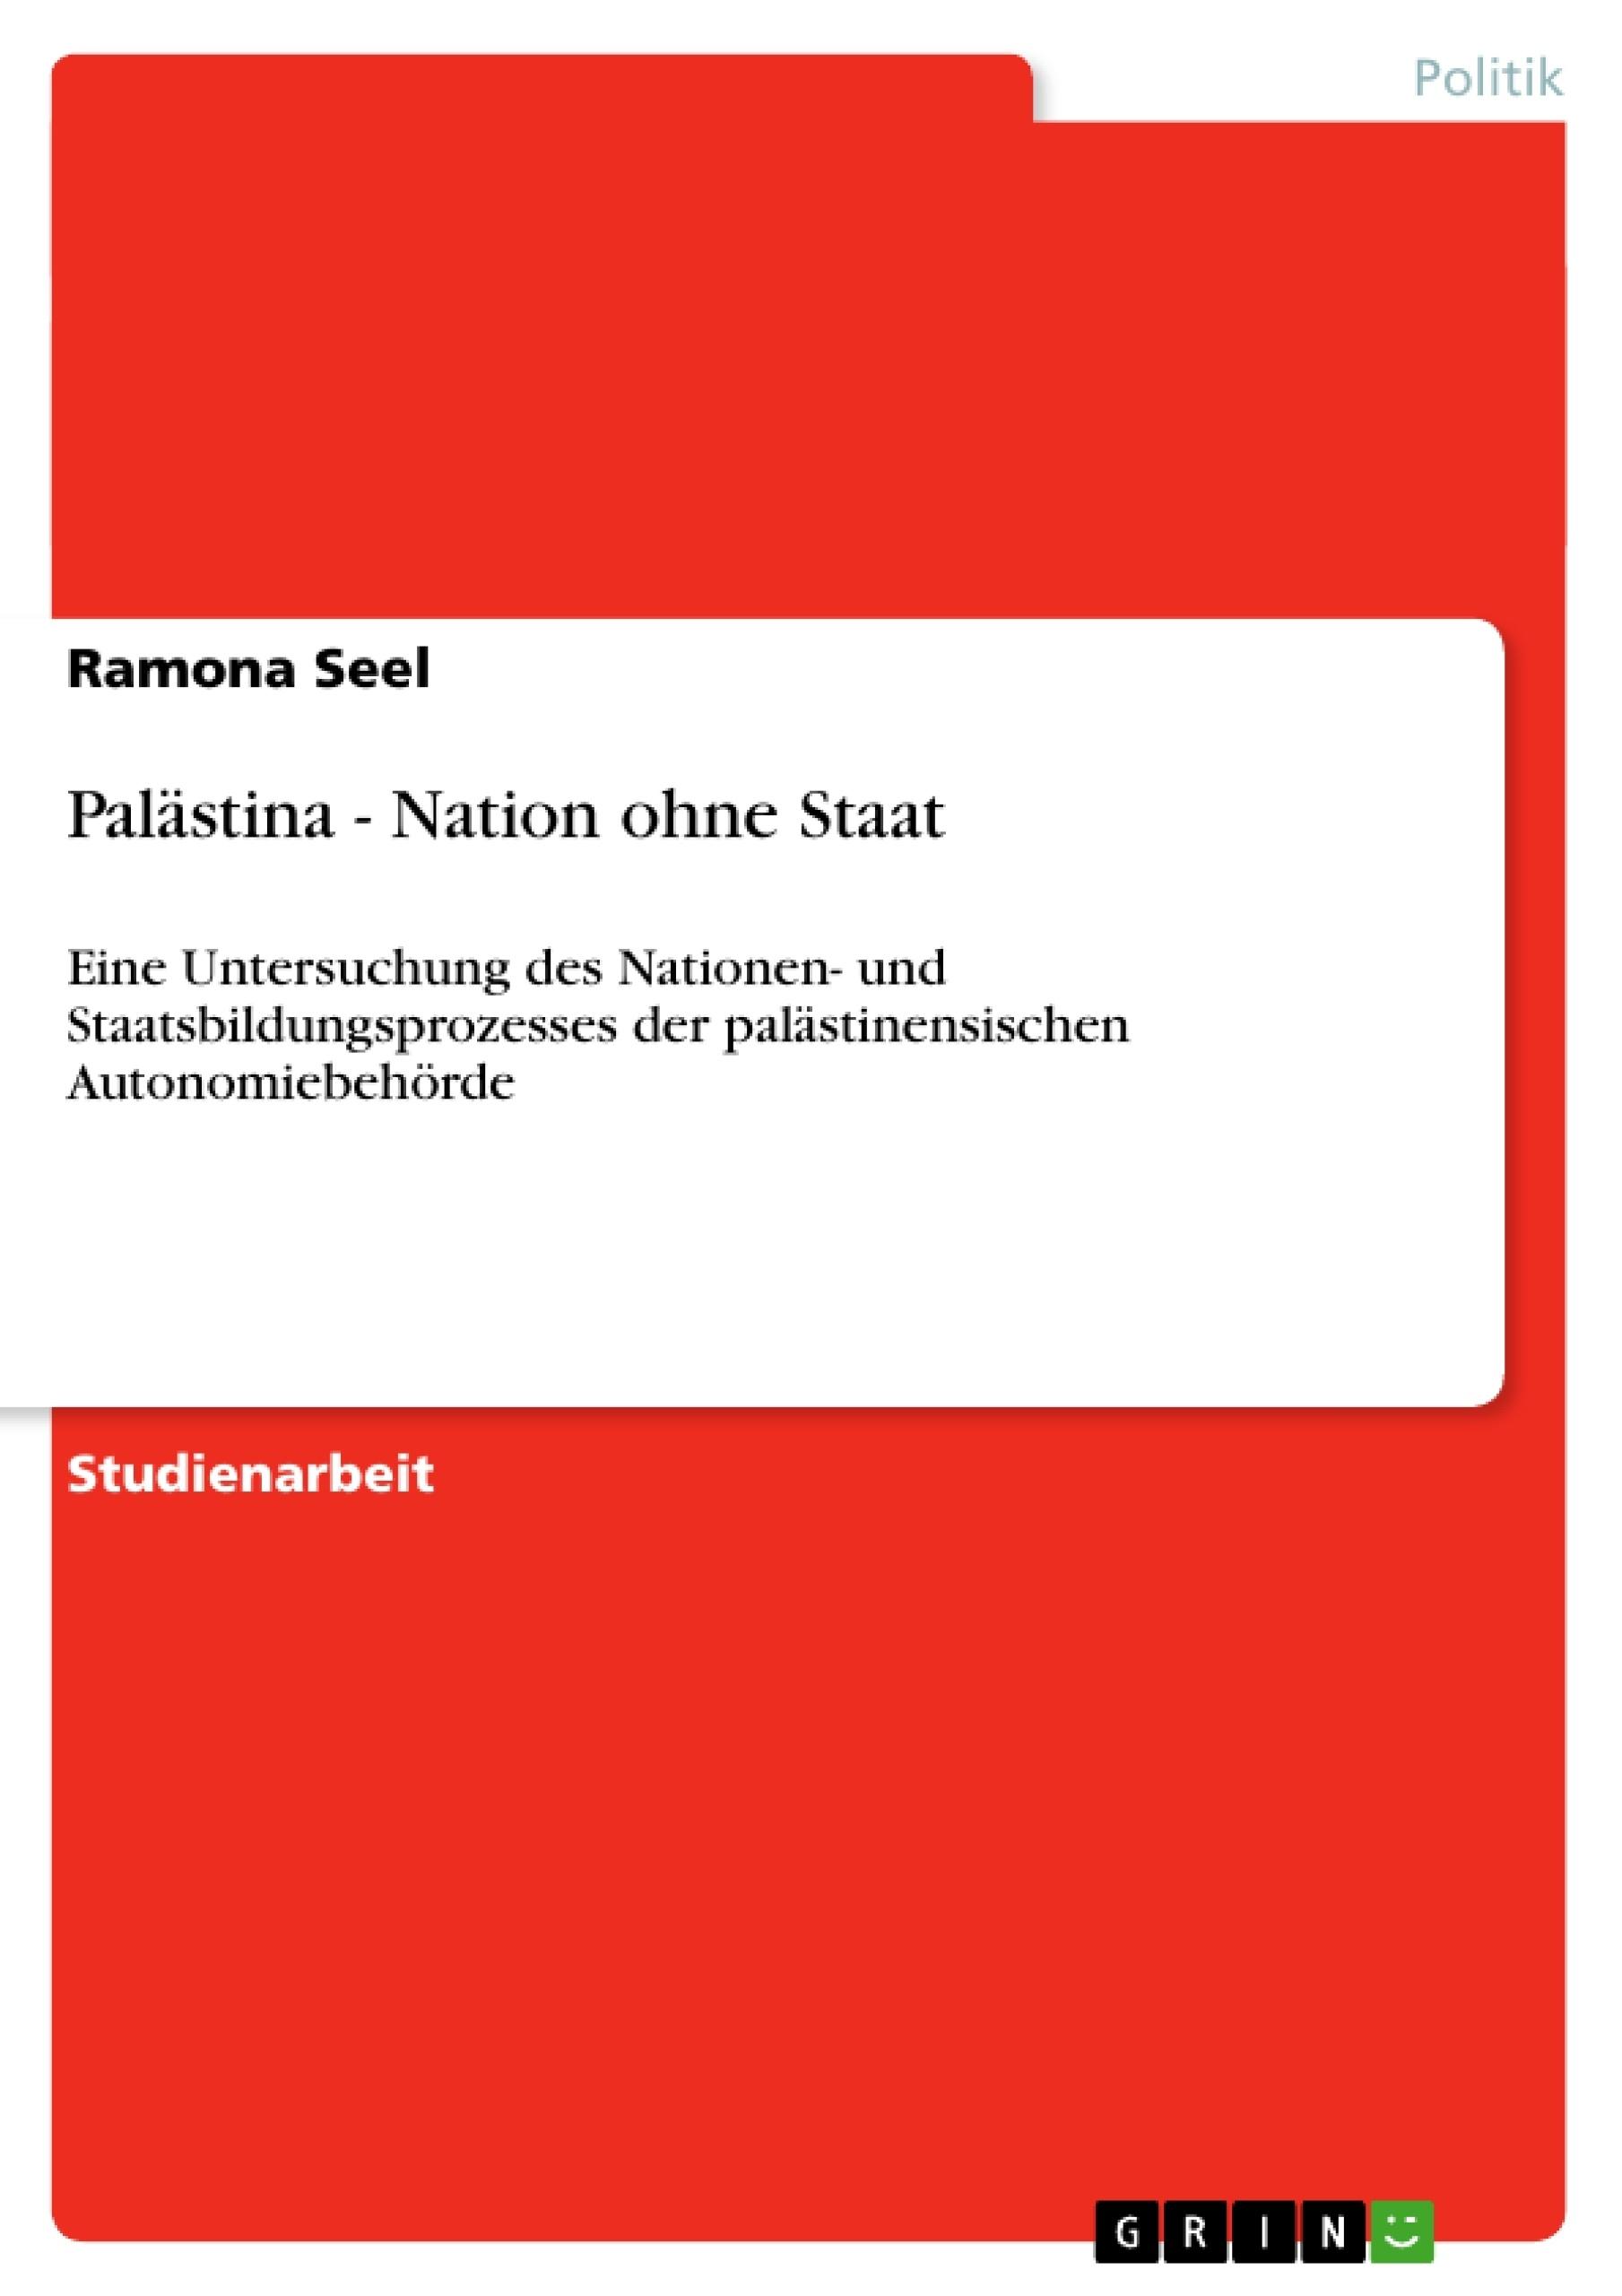 Titel: Palästina - Nation ohne Staat